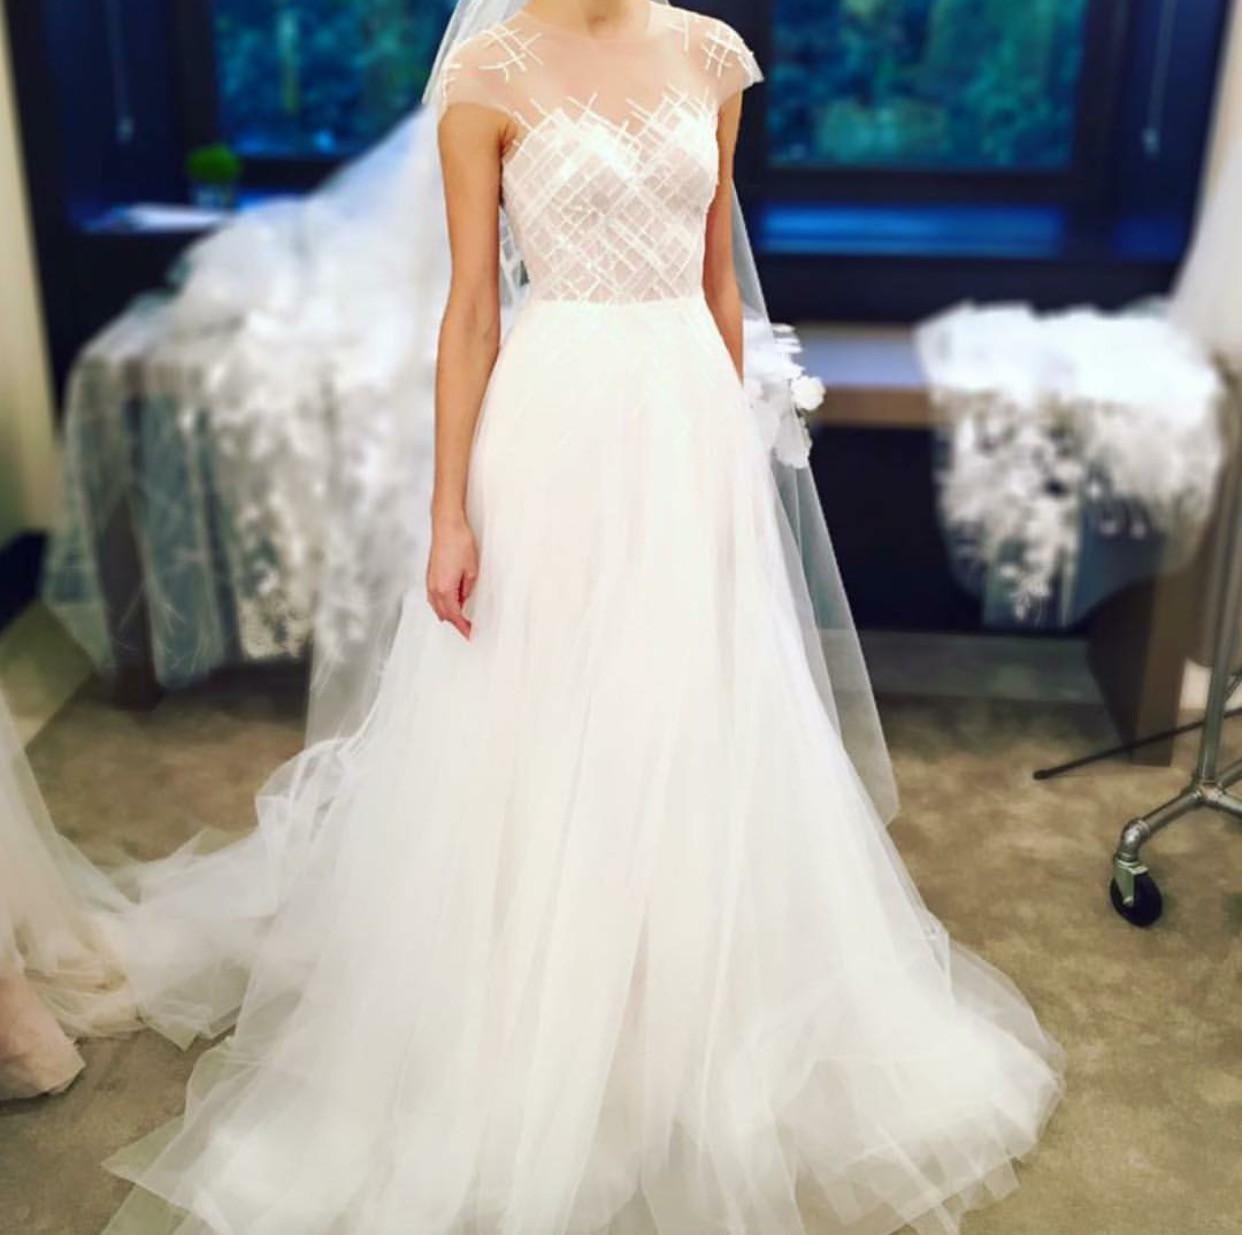 Simple Wedding Dress Hong Kong: Mira Zwillinger Ray Wedding Dress On Sale 60% Off